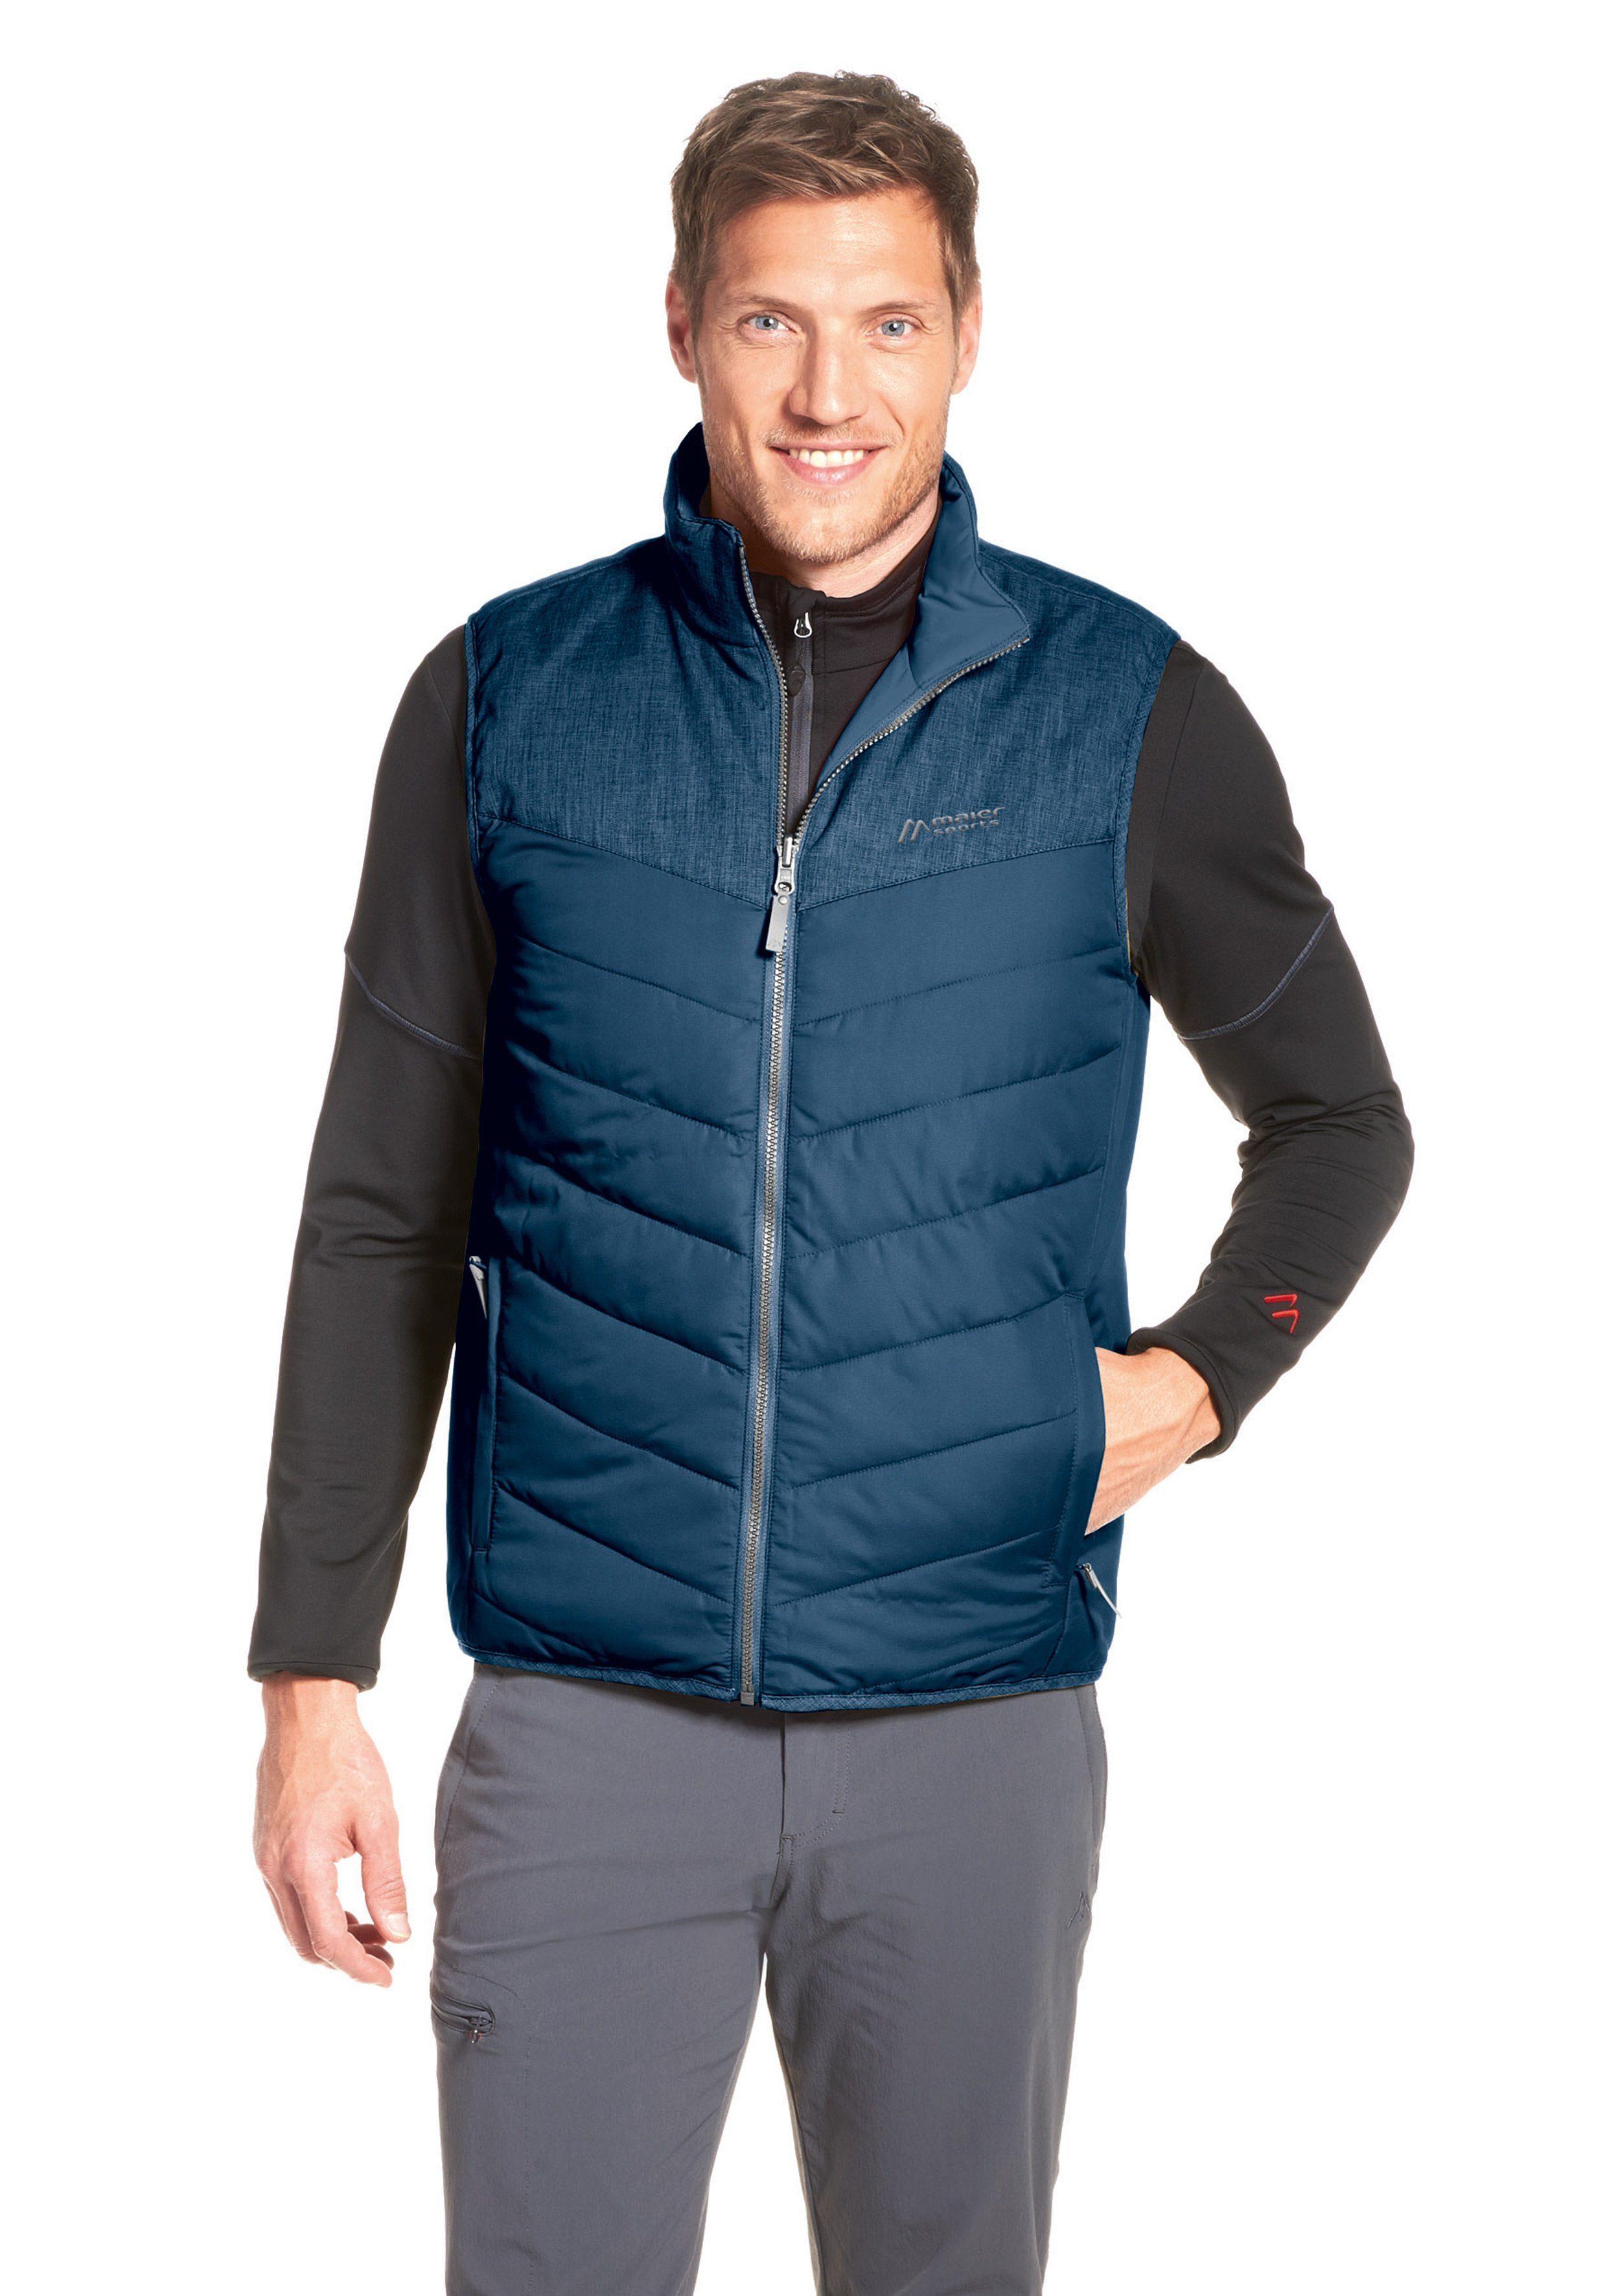 Maier Sports Steppjacke Gero Vest | Sportbekleidung > Sportjacken > Steppjacken | Blau | Maier Sports